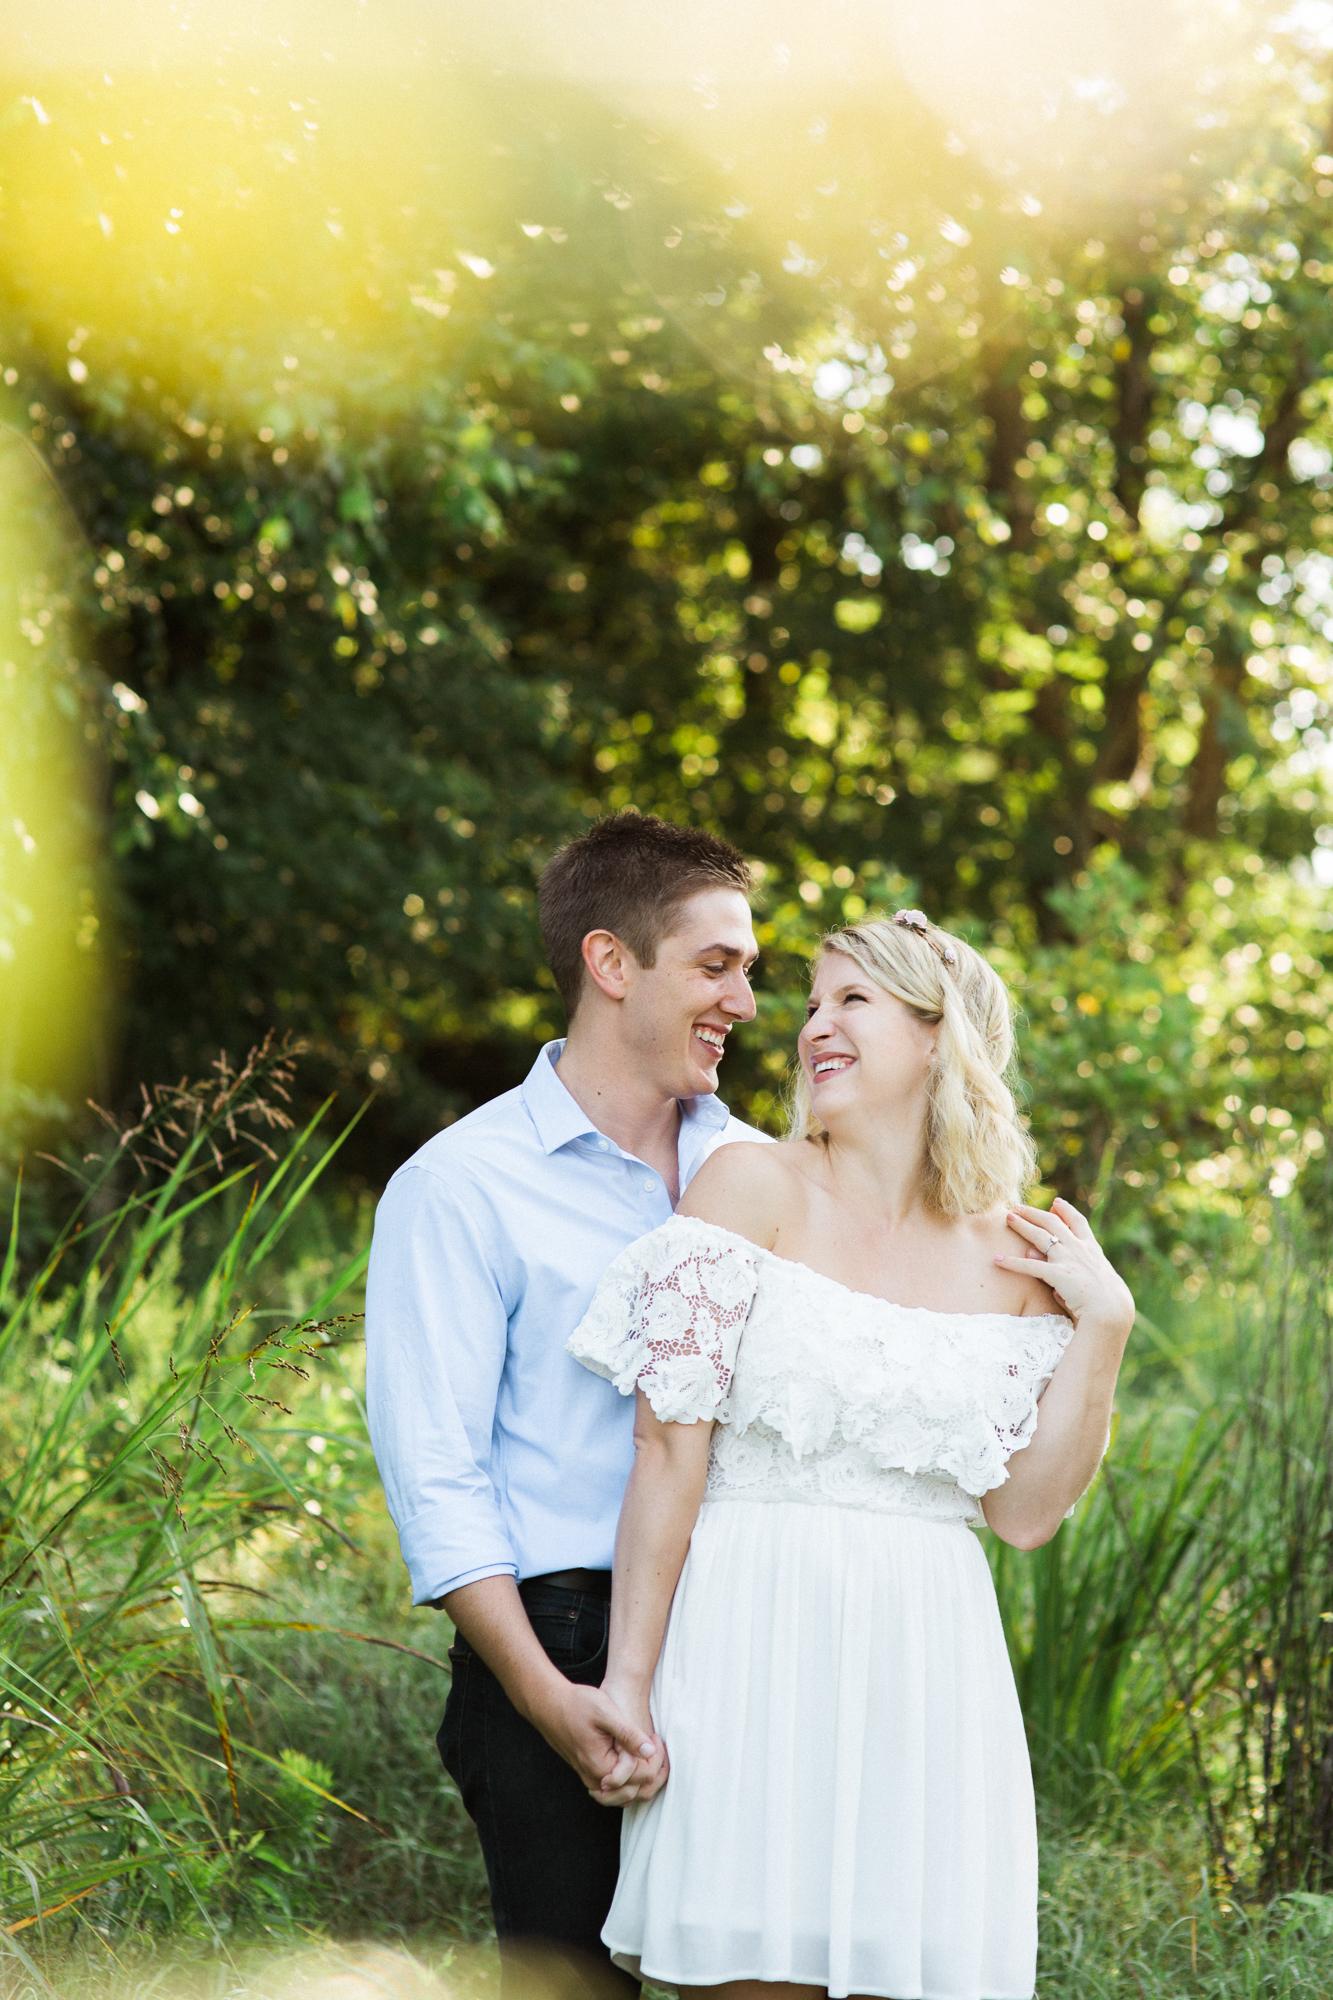 Josh & Audrey - Engaged - Memphis, TN - © Kaitlyn Stoddard-Carter-1.jpg